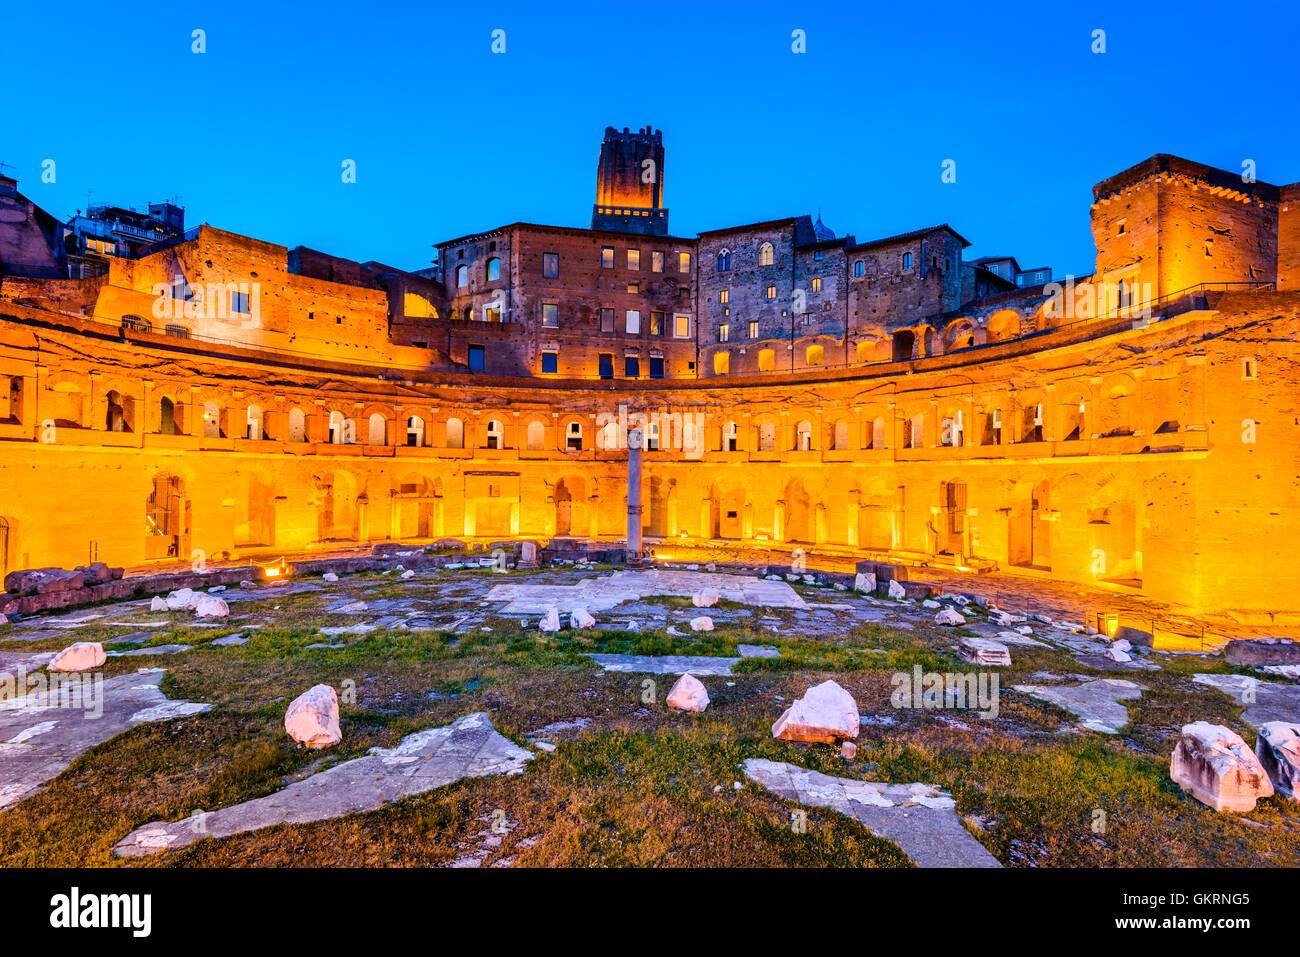 Rome, Italy. Twilight view of ancient Trajan's Market, ruins in Via dei Fori Imperiali, Roma. - Stock Image